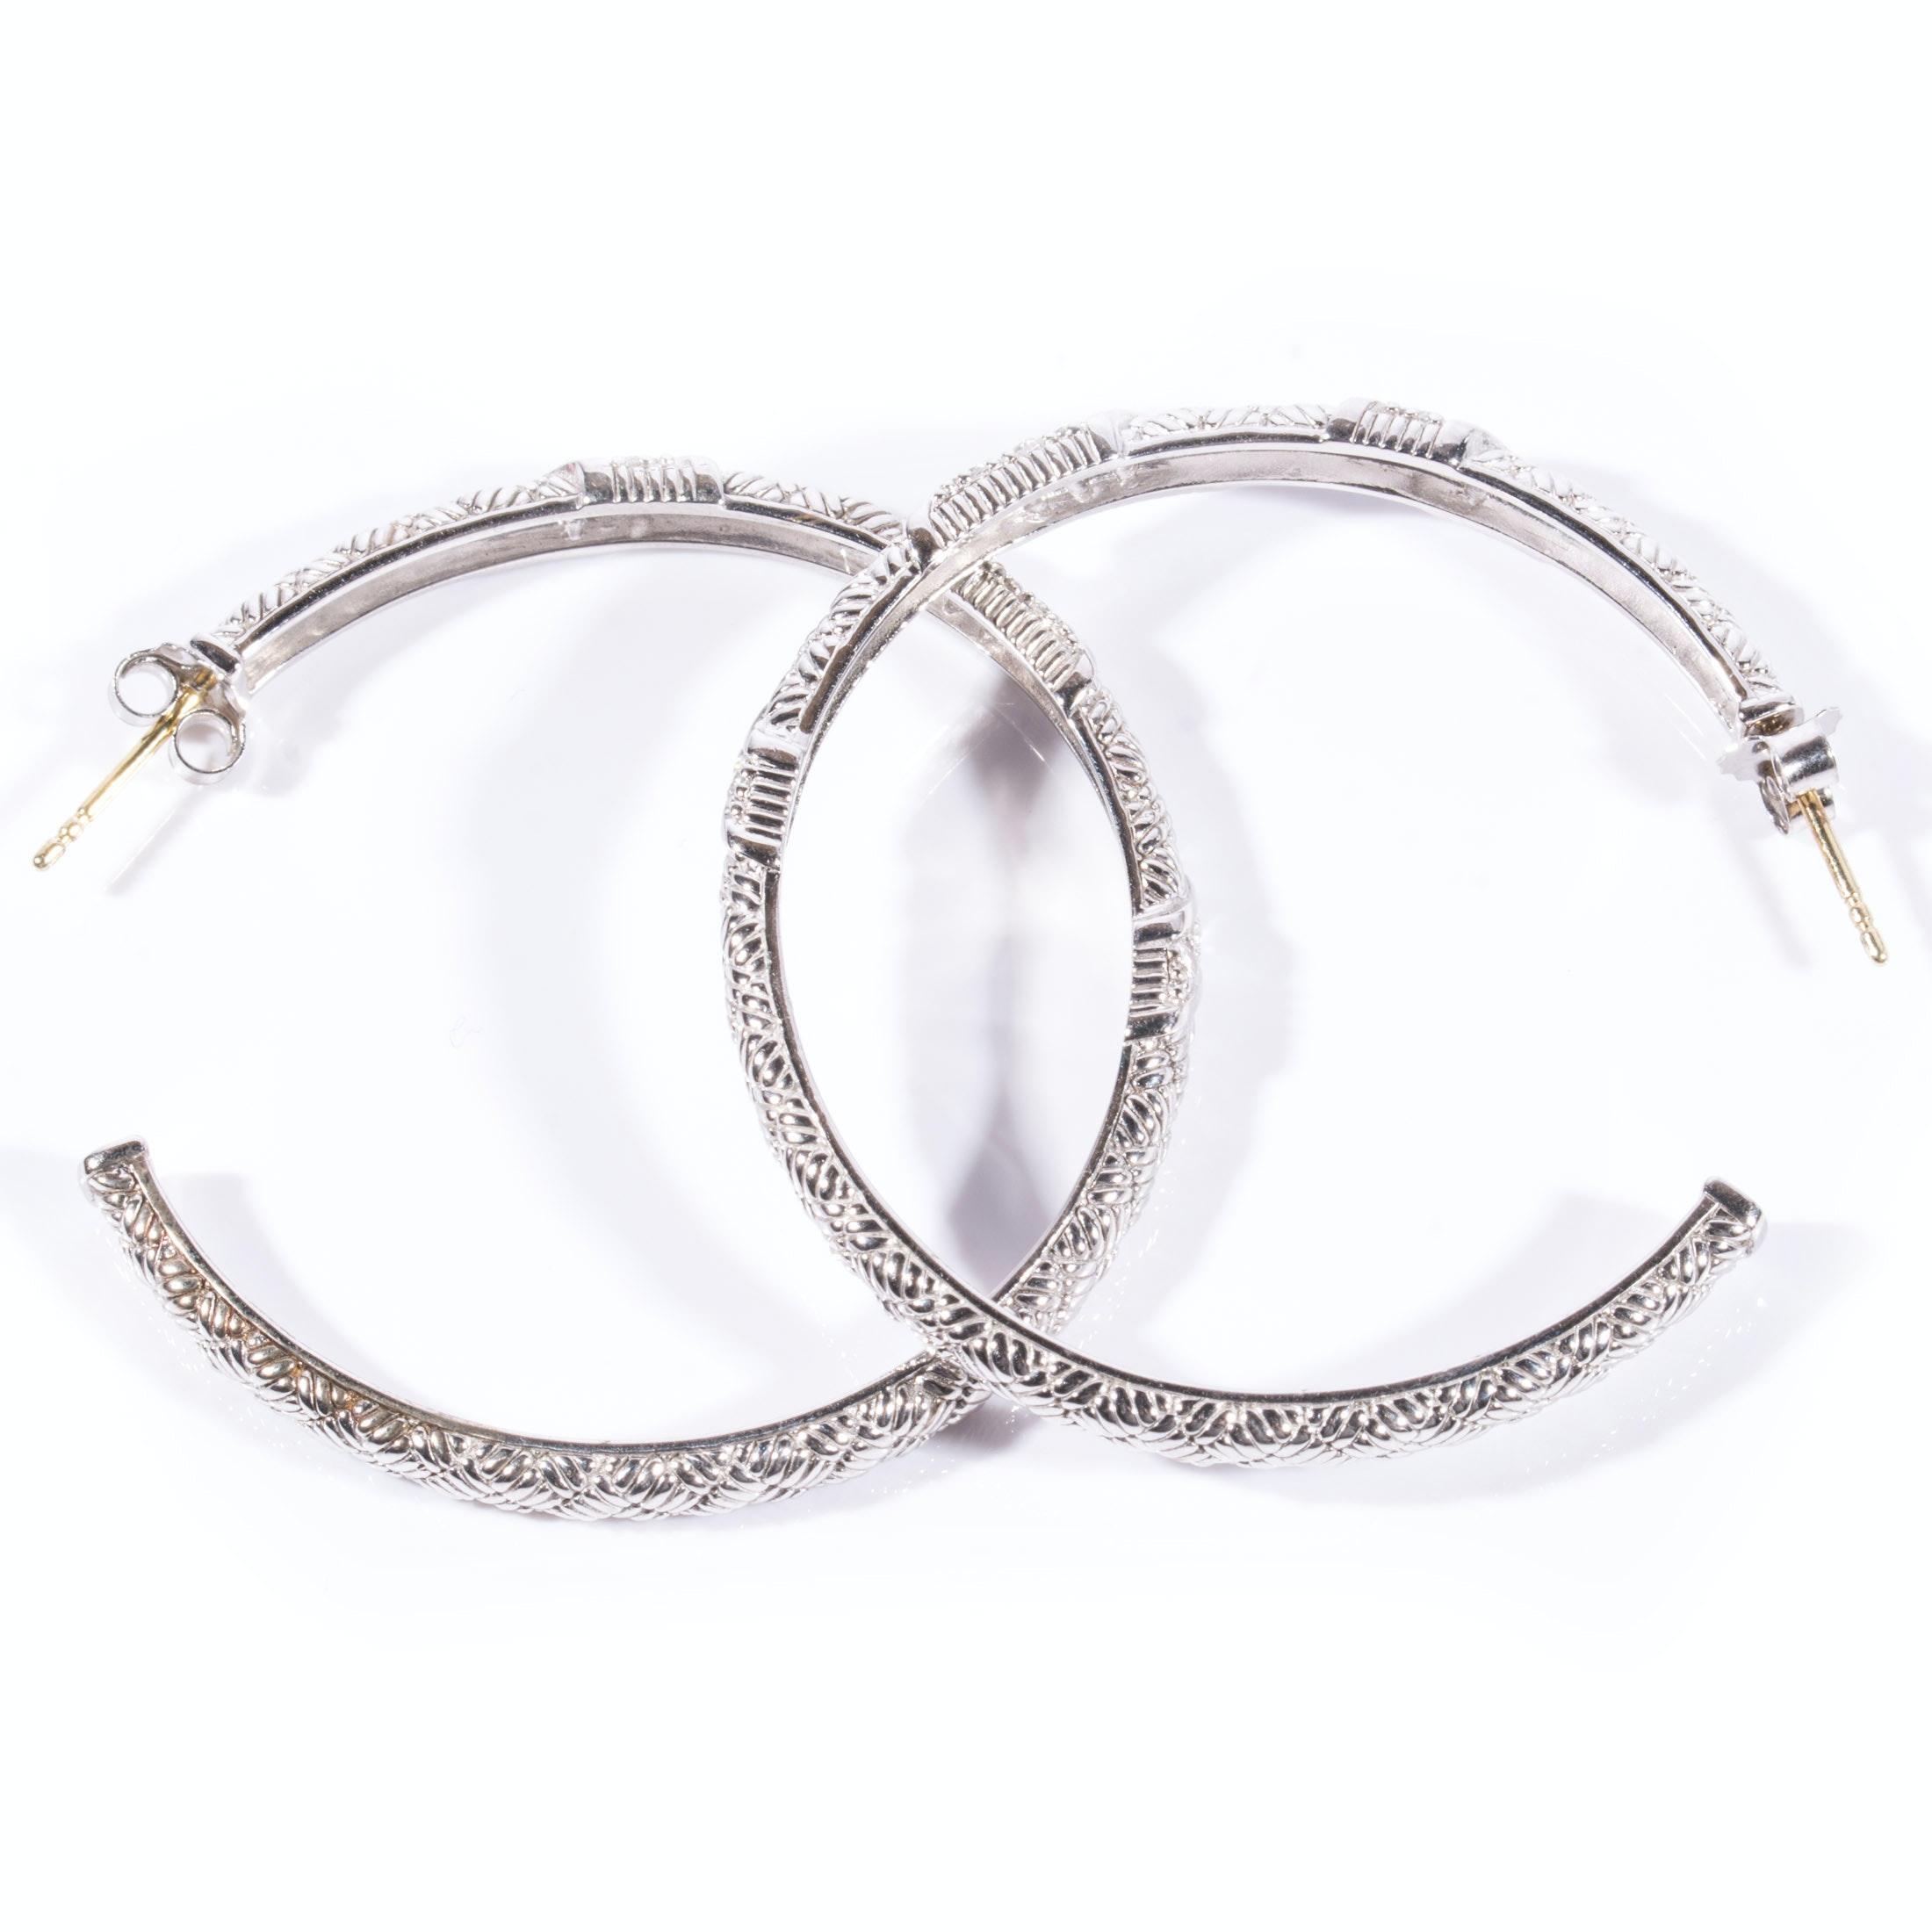 Judith Ripka Sterling Silver and 18K White Sapphire Large Hoop Earrings